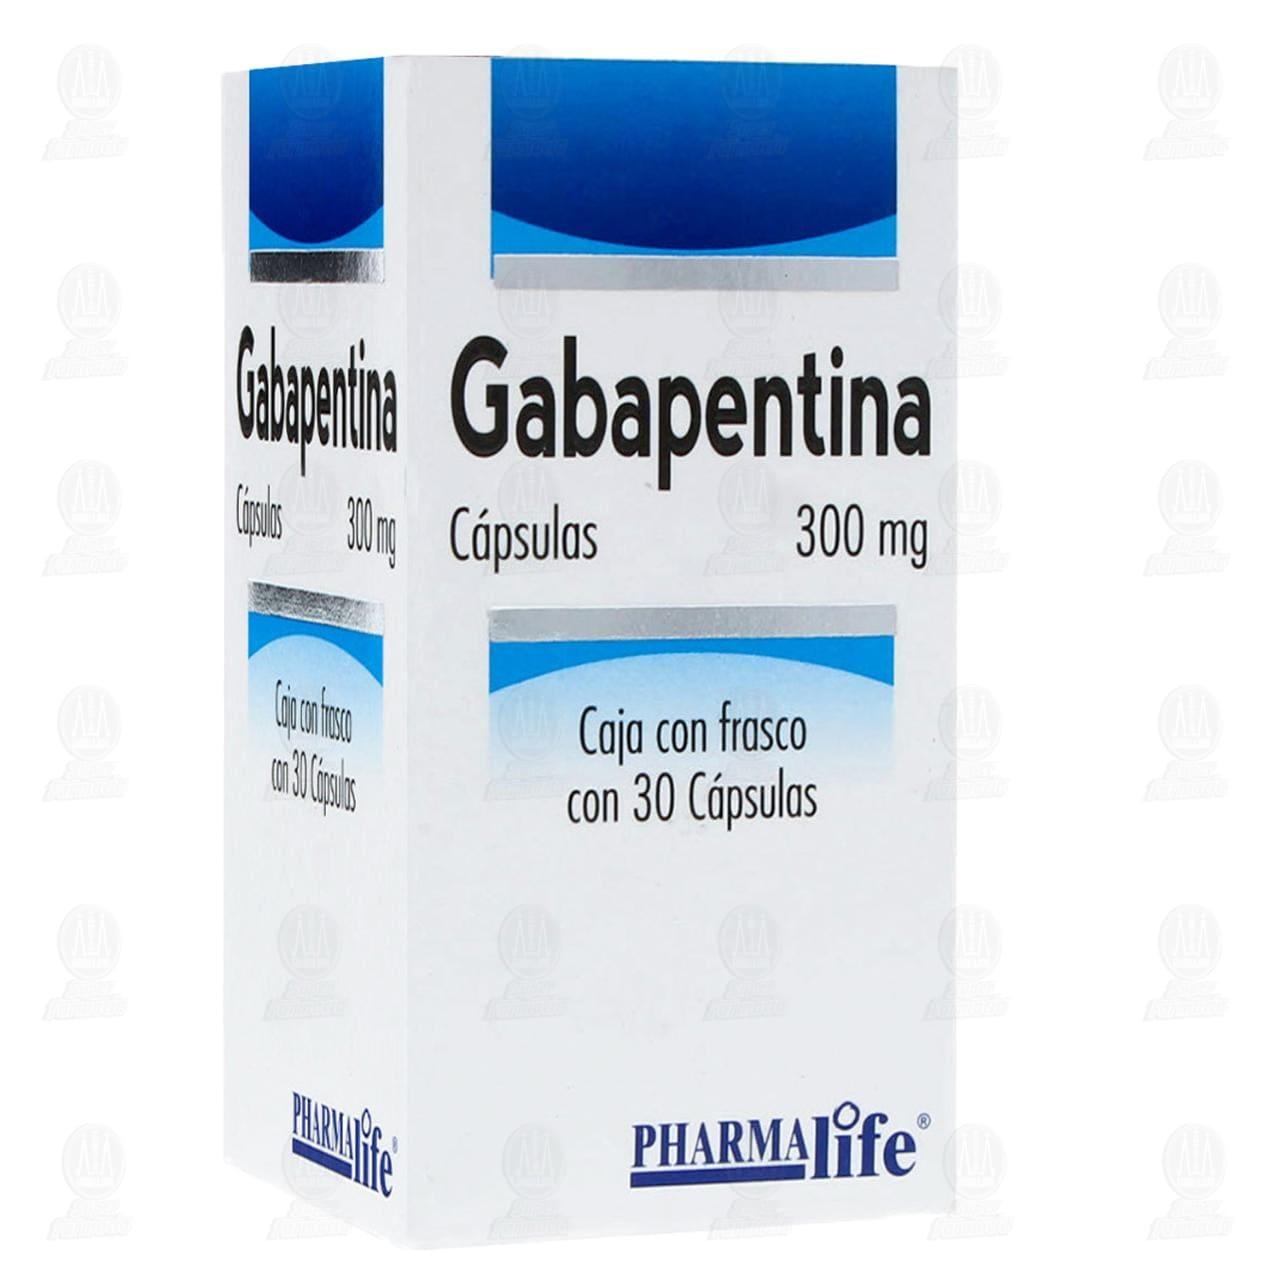 Comprar Gabapentina 300mg 30 Cápsulas Pharmalife en Farmacias Guadalajara